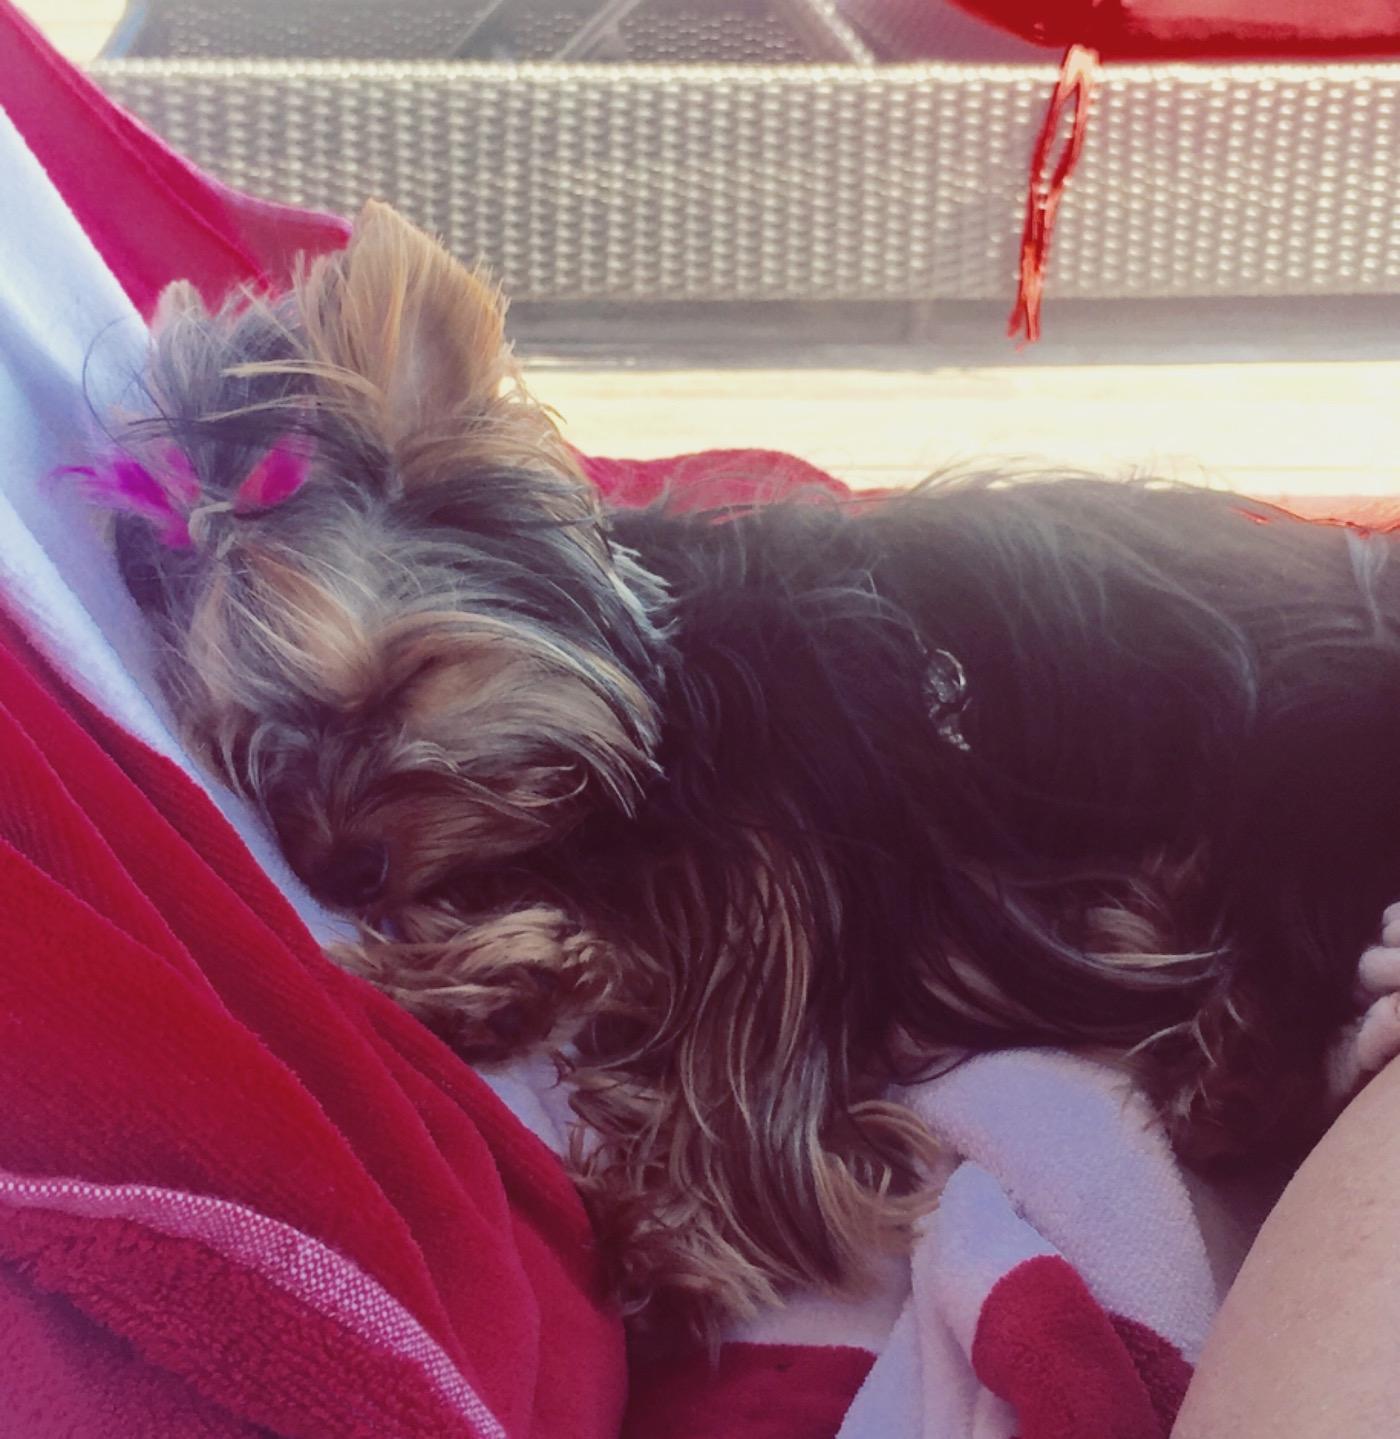 Sleeping on the Dock, Muskoka